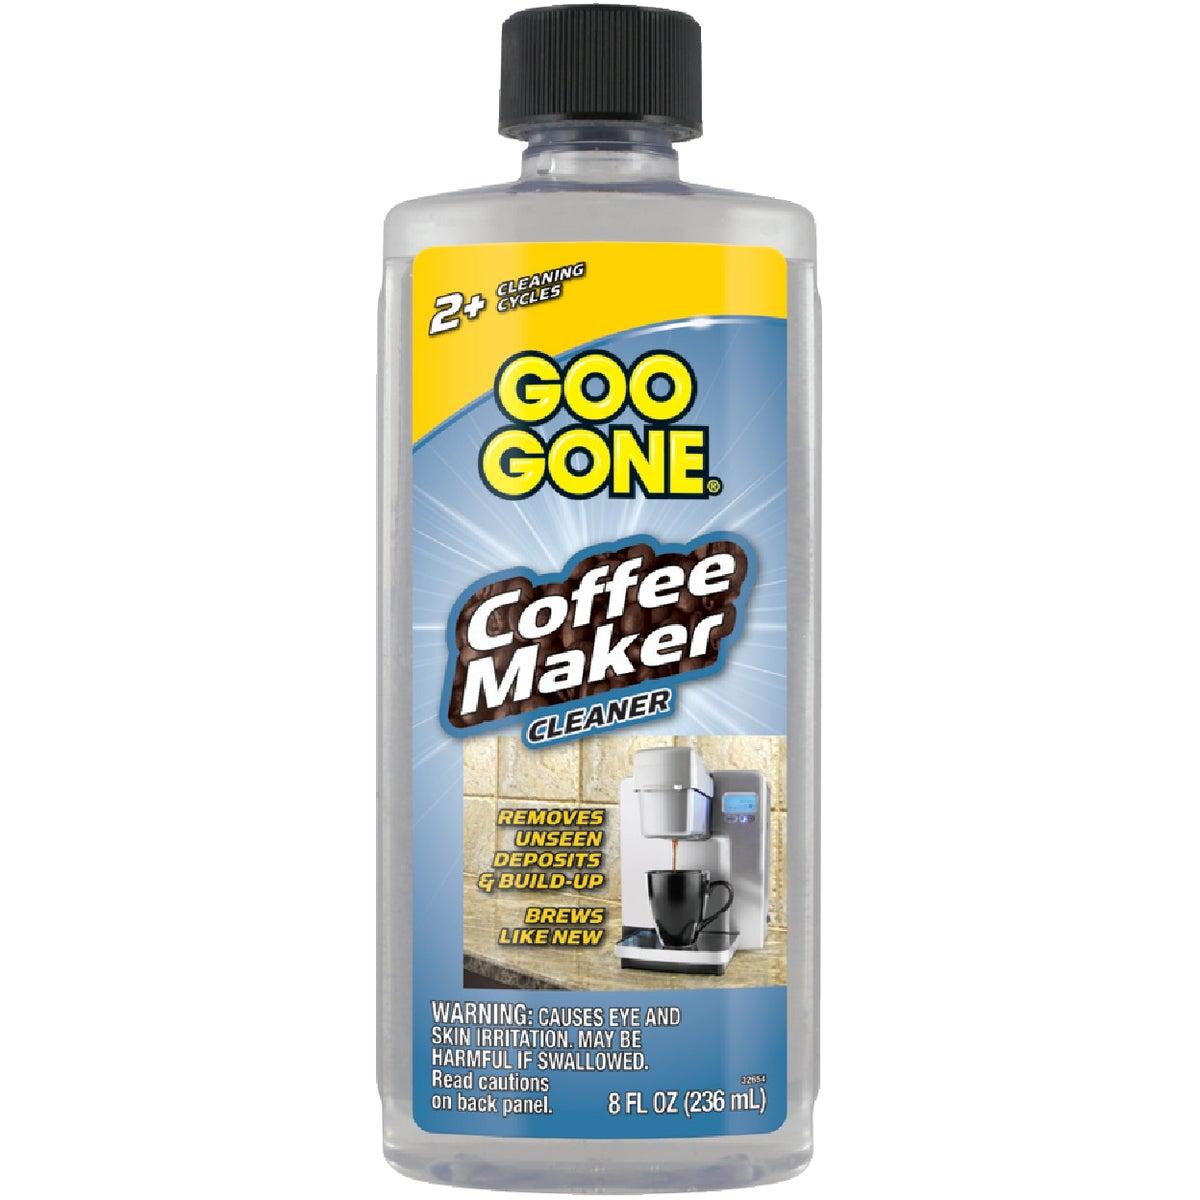 8OZ COFFEE MAKER CLEANER